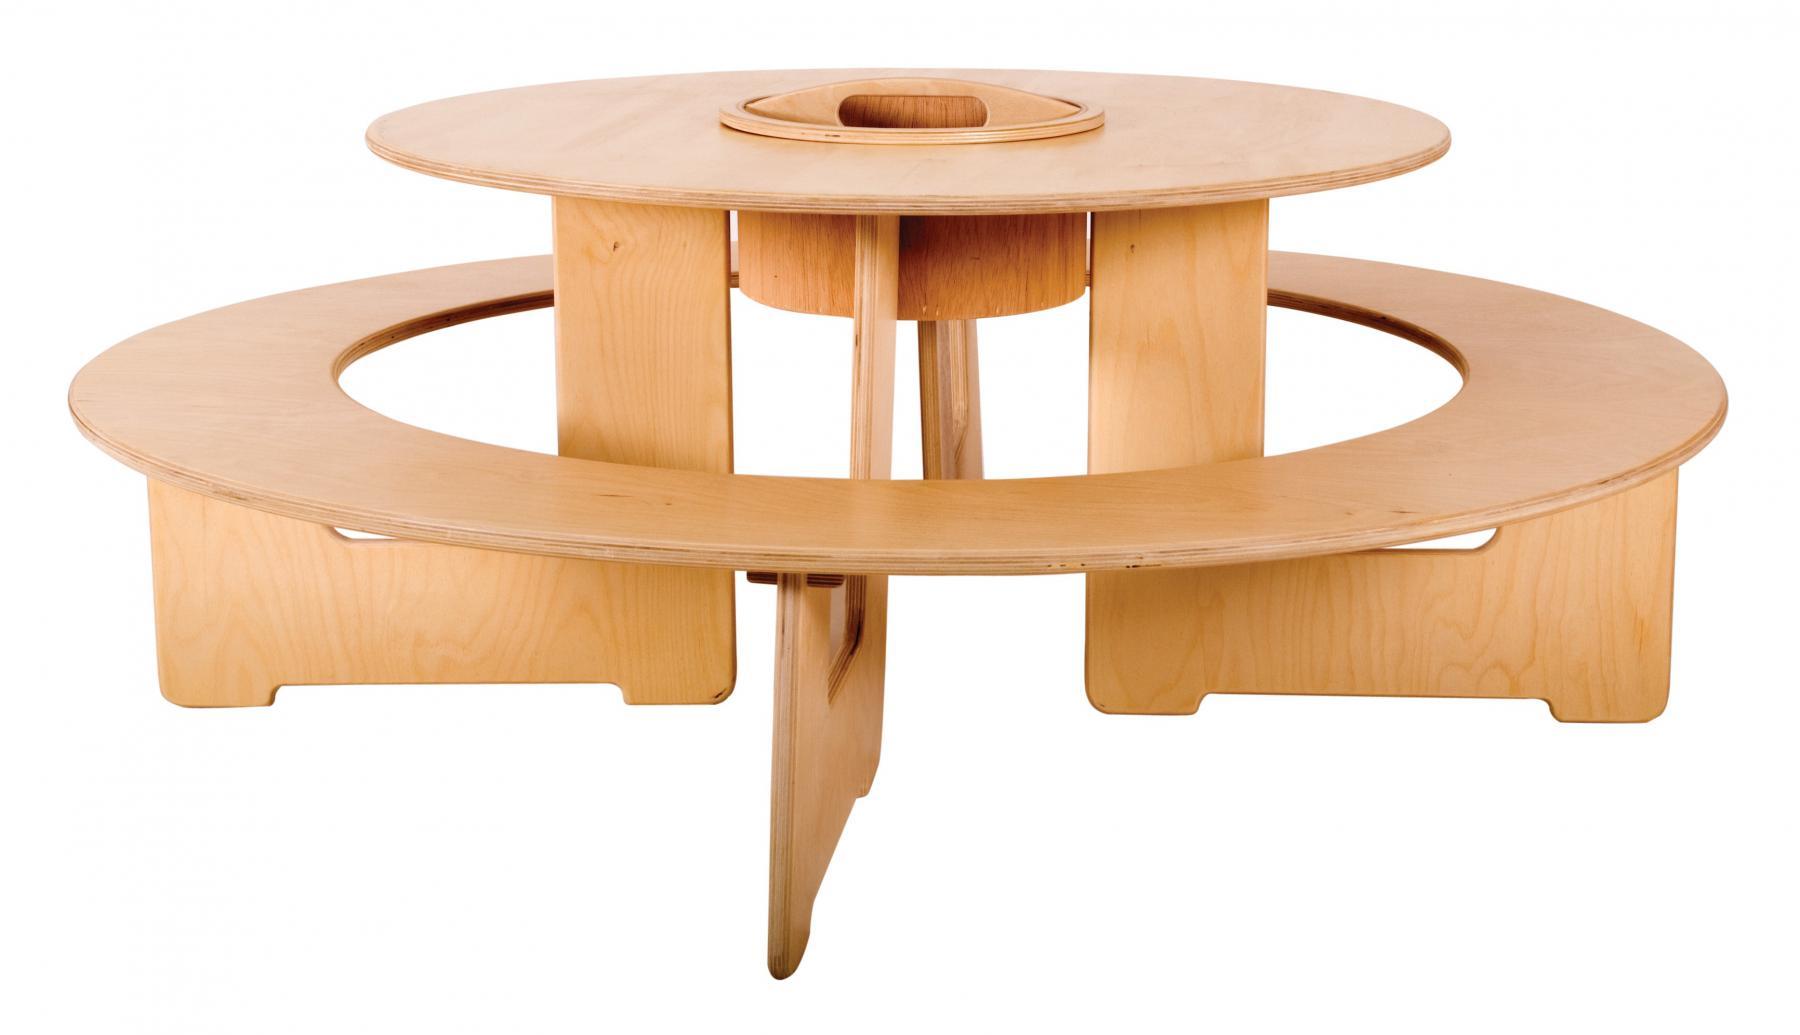 allstars kindersitzgruppe tischgruppe tisch bank kindersitzgarnitur kinderm bel kaufen bei. Black Bedroom Furniture Sets. Home Design Ideas